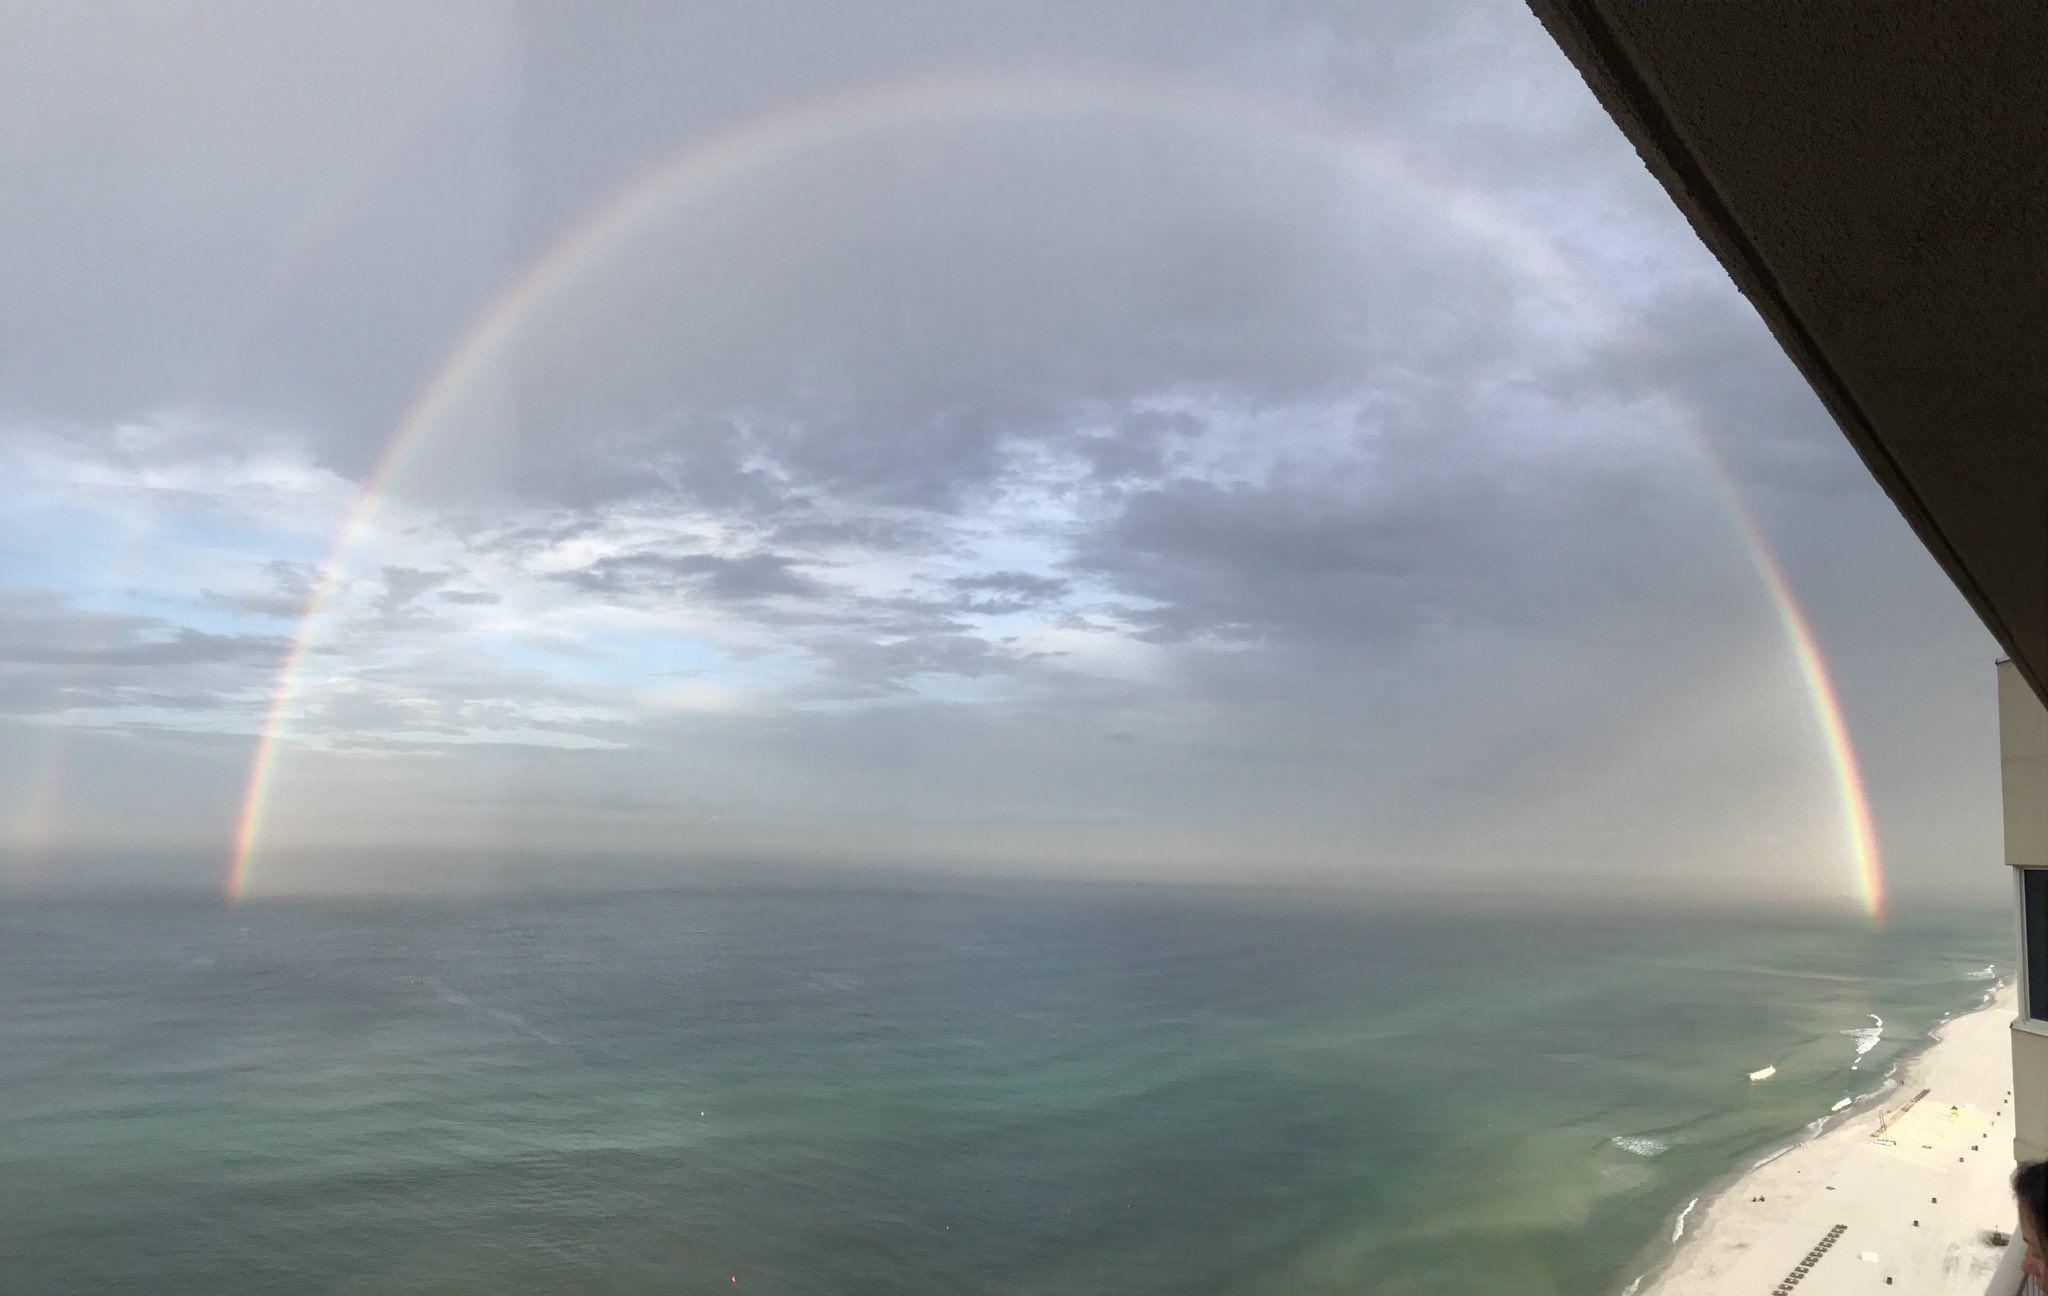 Rainbow this morning at Panama City Beach... photo from @coachscott34